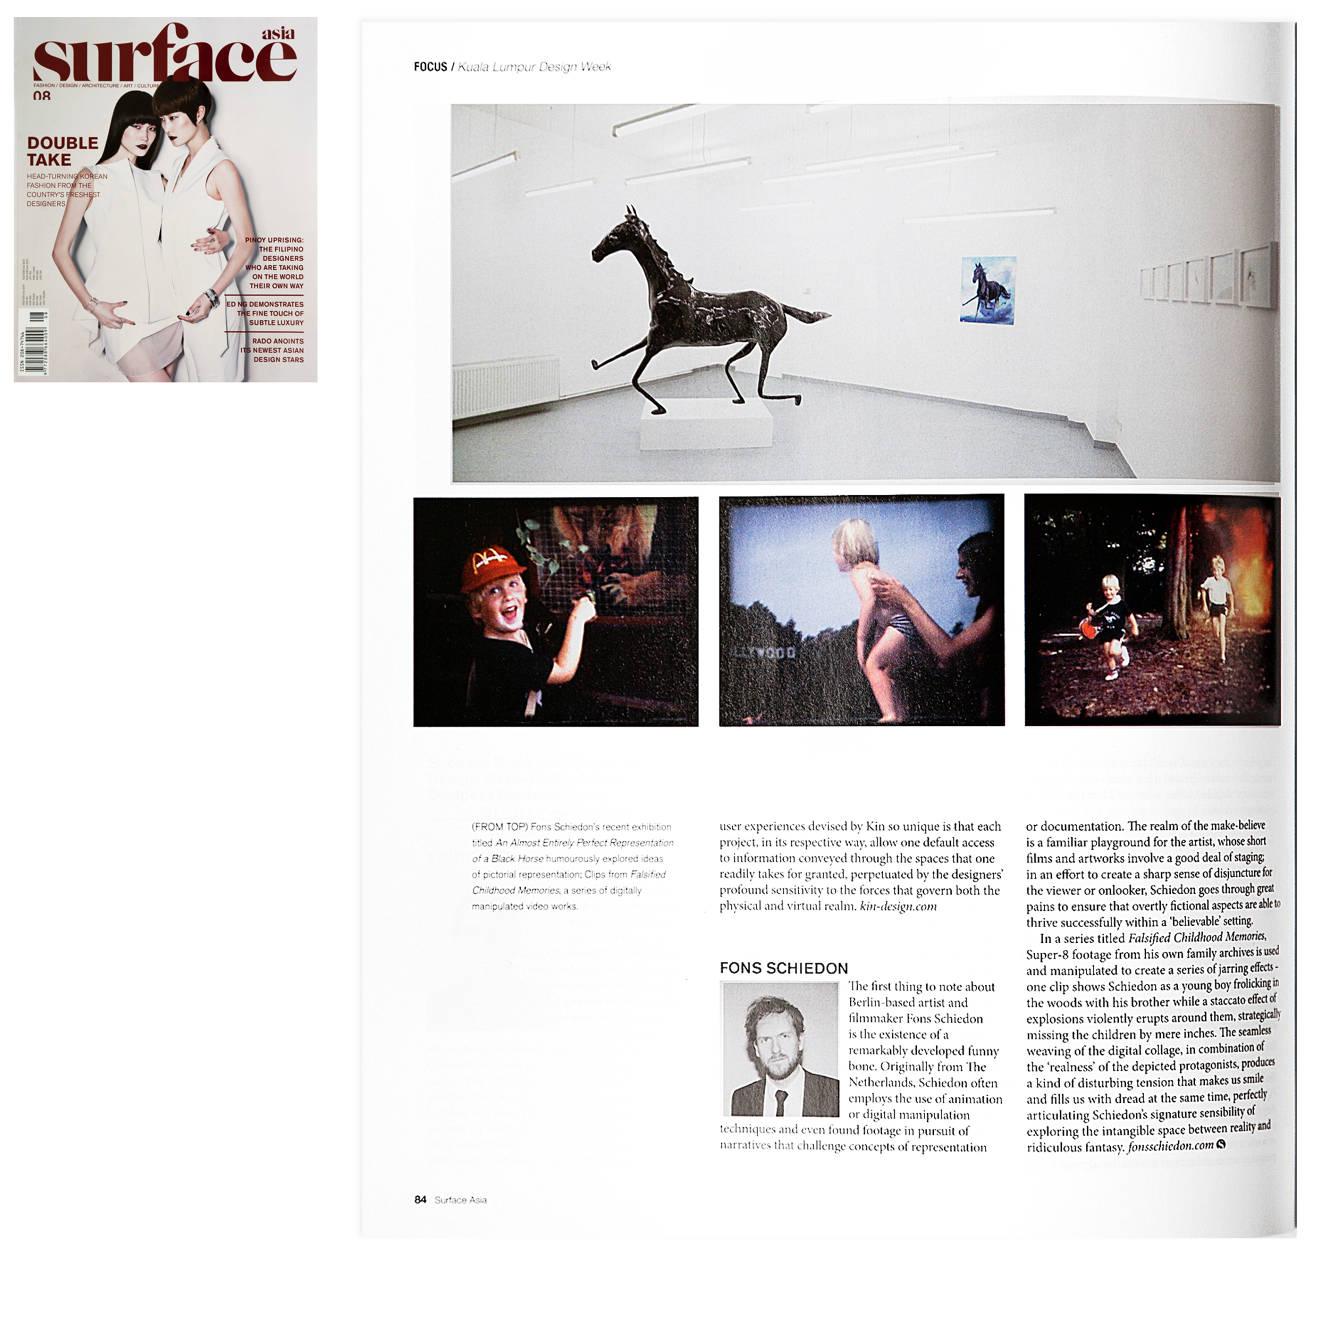 Surface_Magazine_2011_08_2x.jpg